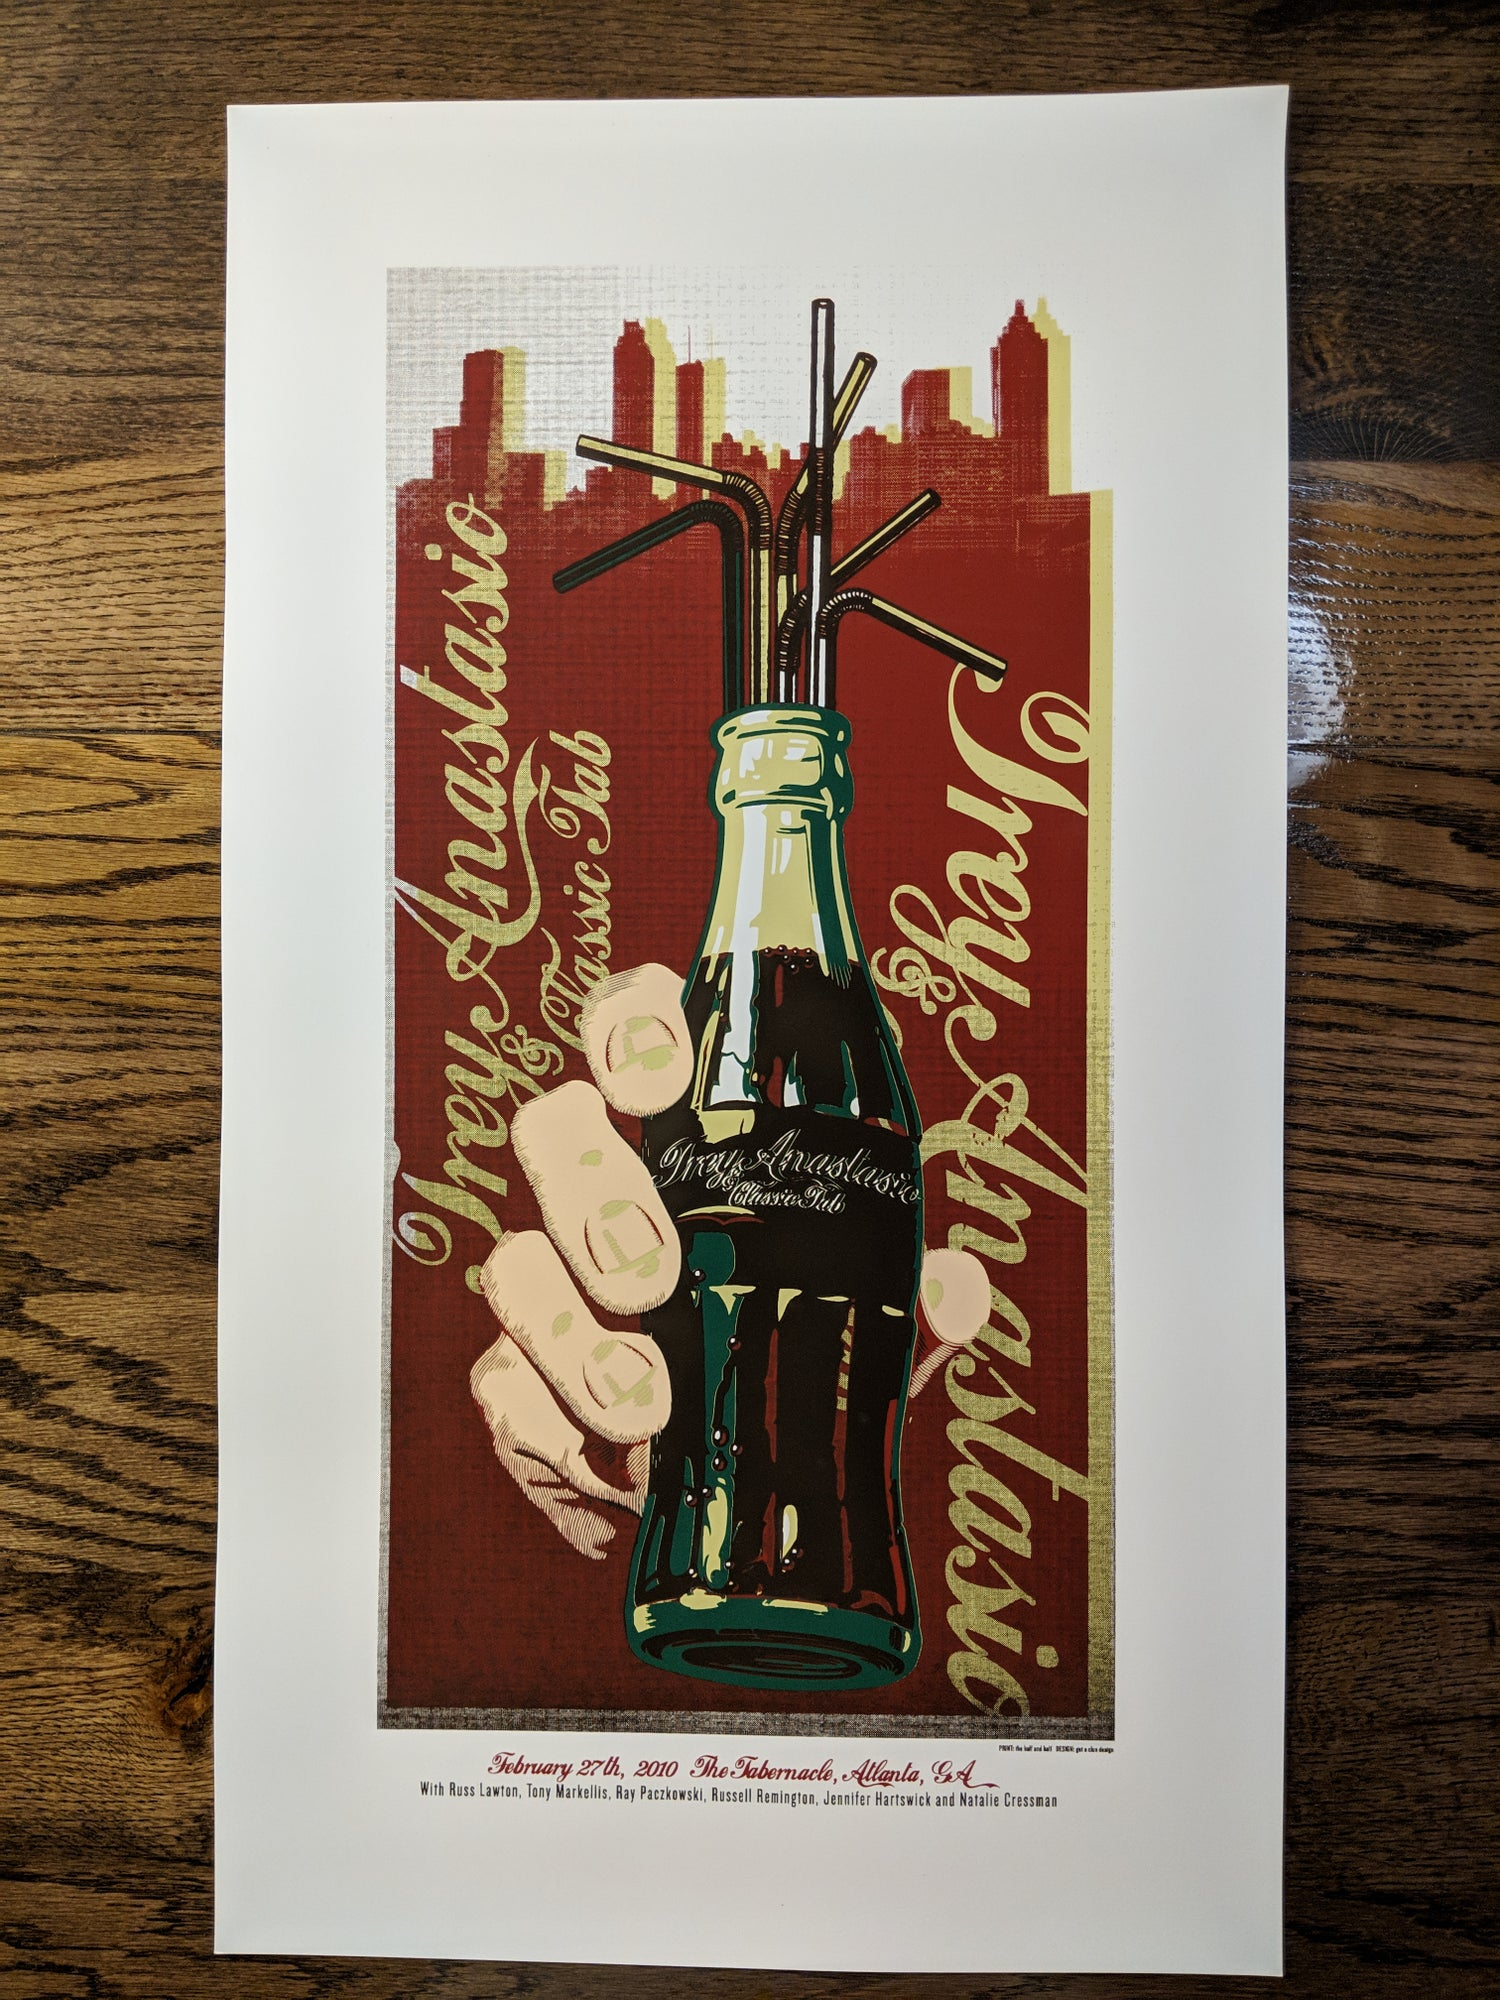 Image of Trey Anastasio - Coke Bottle **RECENTLY DISCOVERED**